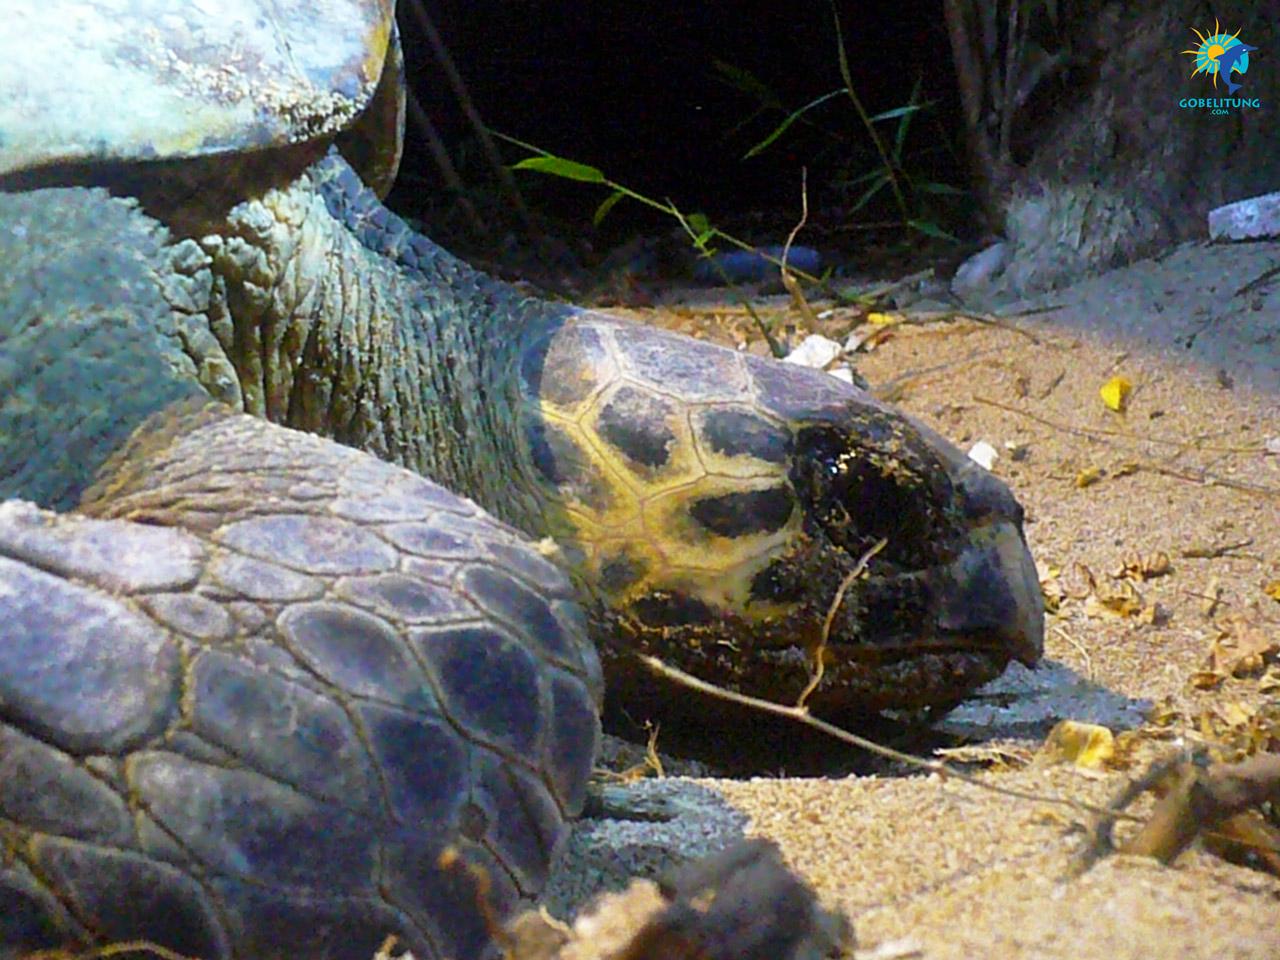 conservation des tortues de mer Belitung GoBelitung Indonesia